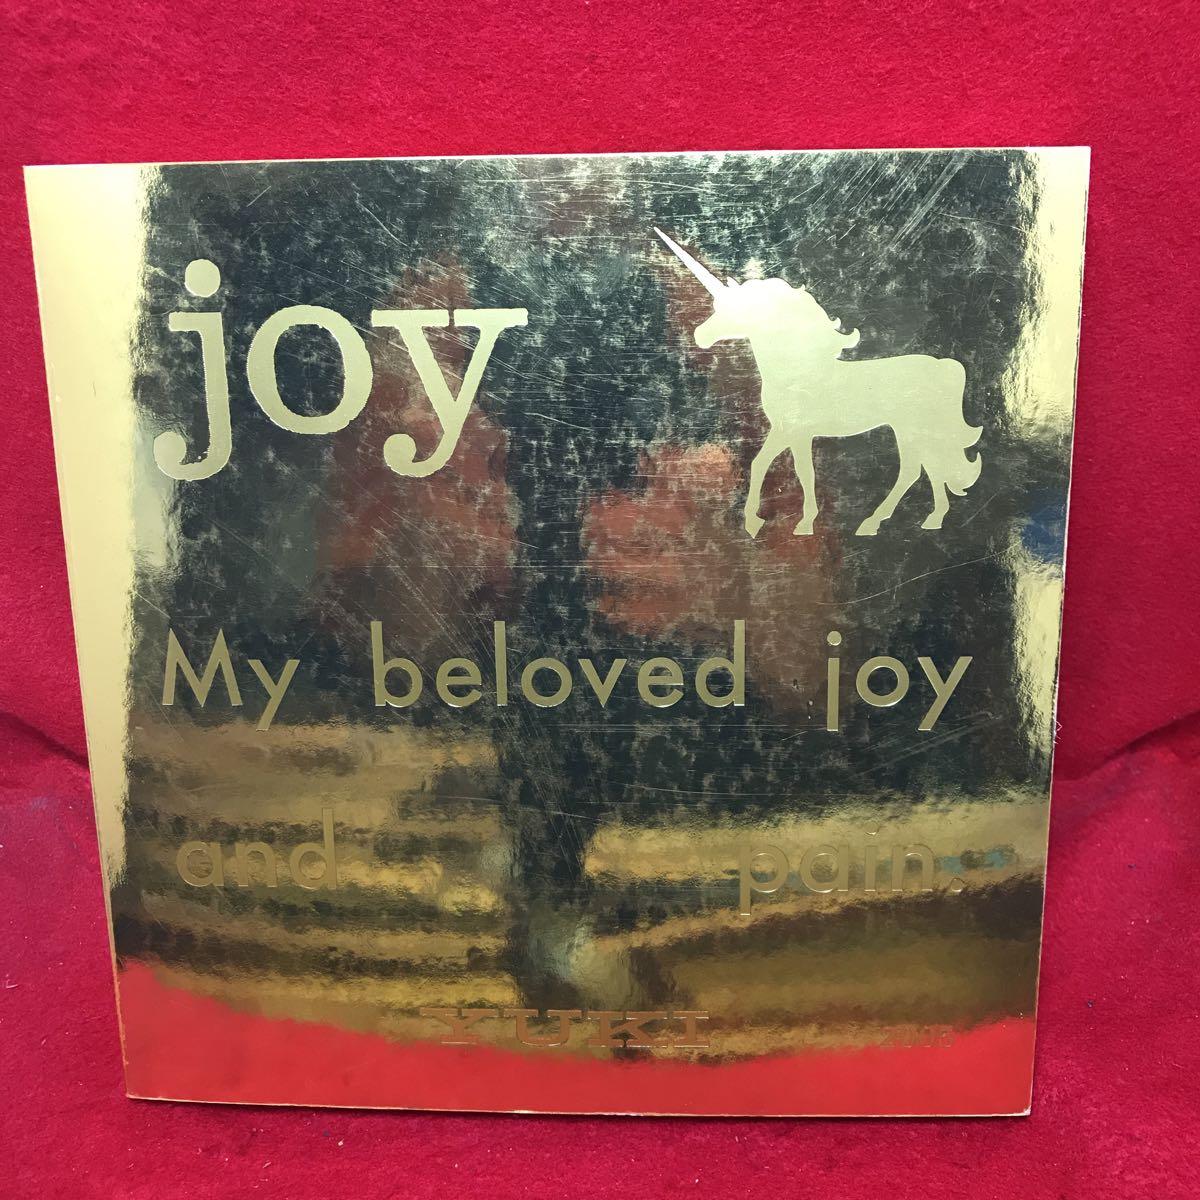 ○YUKI joy TOUR 2005 My beloved joy and pain. ユキ パンフレット 元JUDY AND MARY